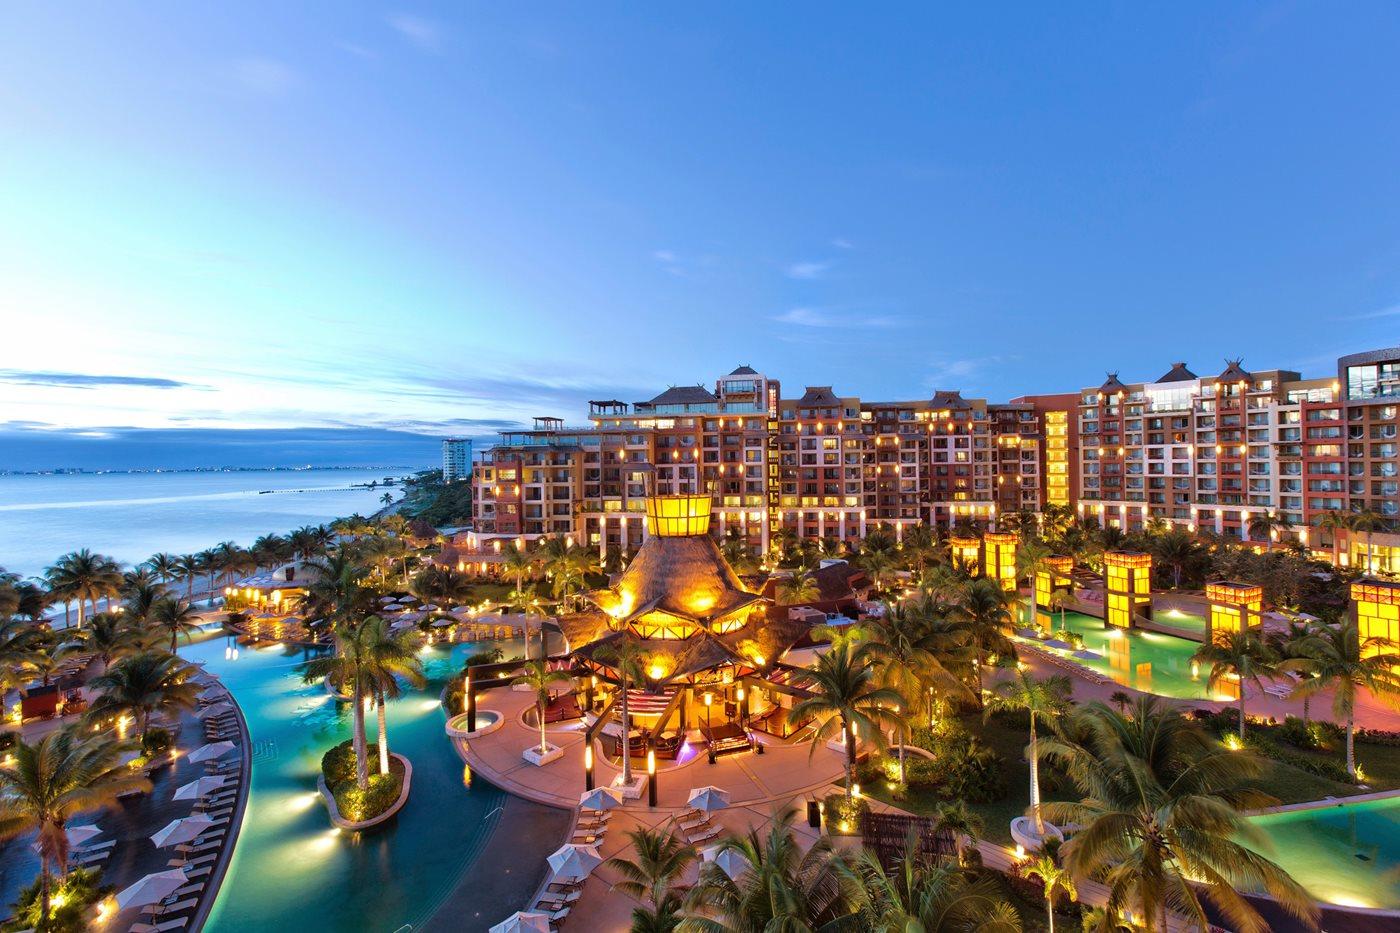 Villa Del Palmar Luxury Beach Resort Spa